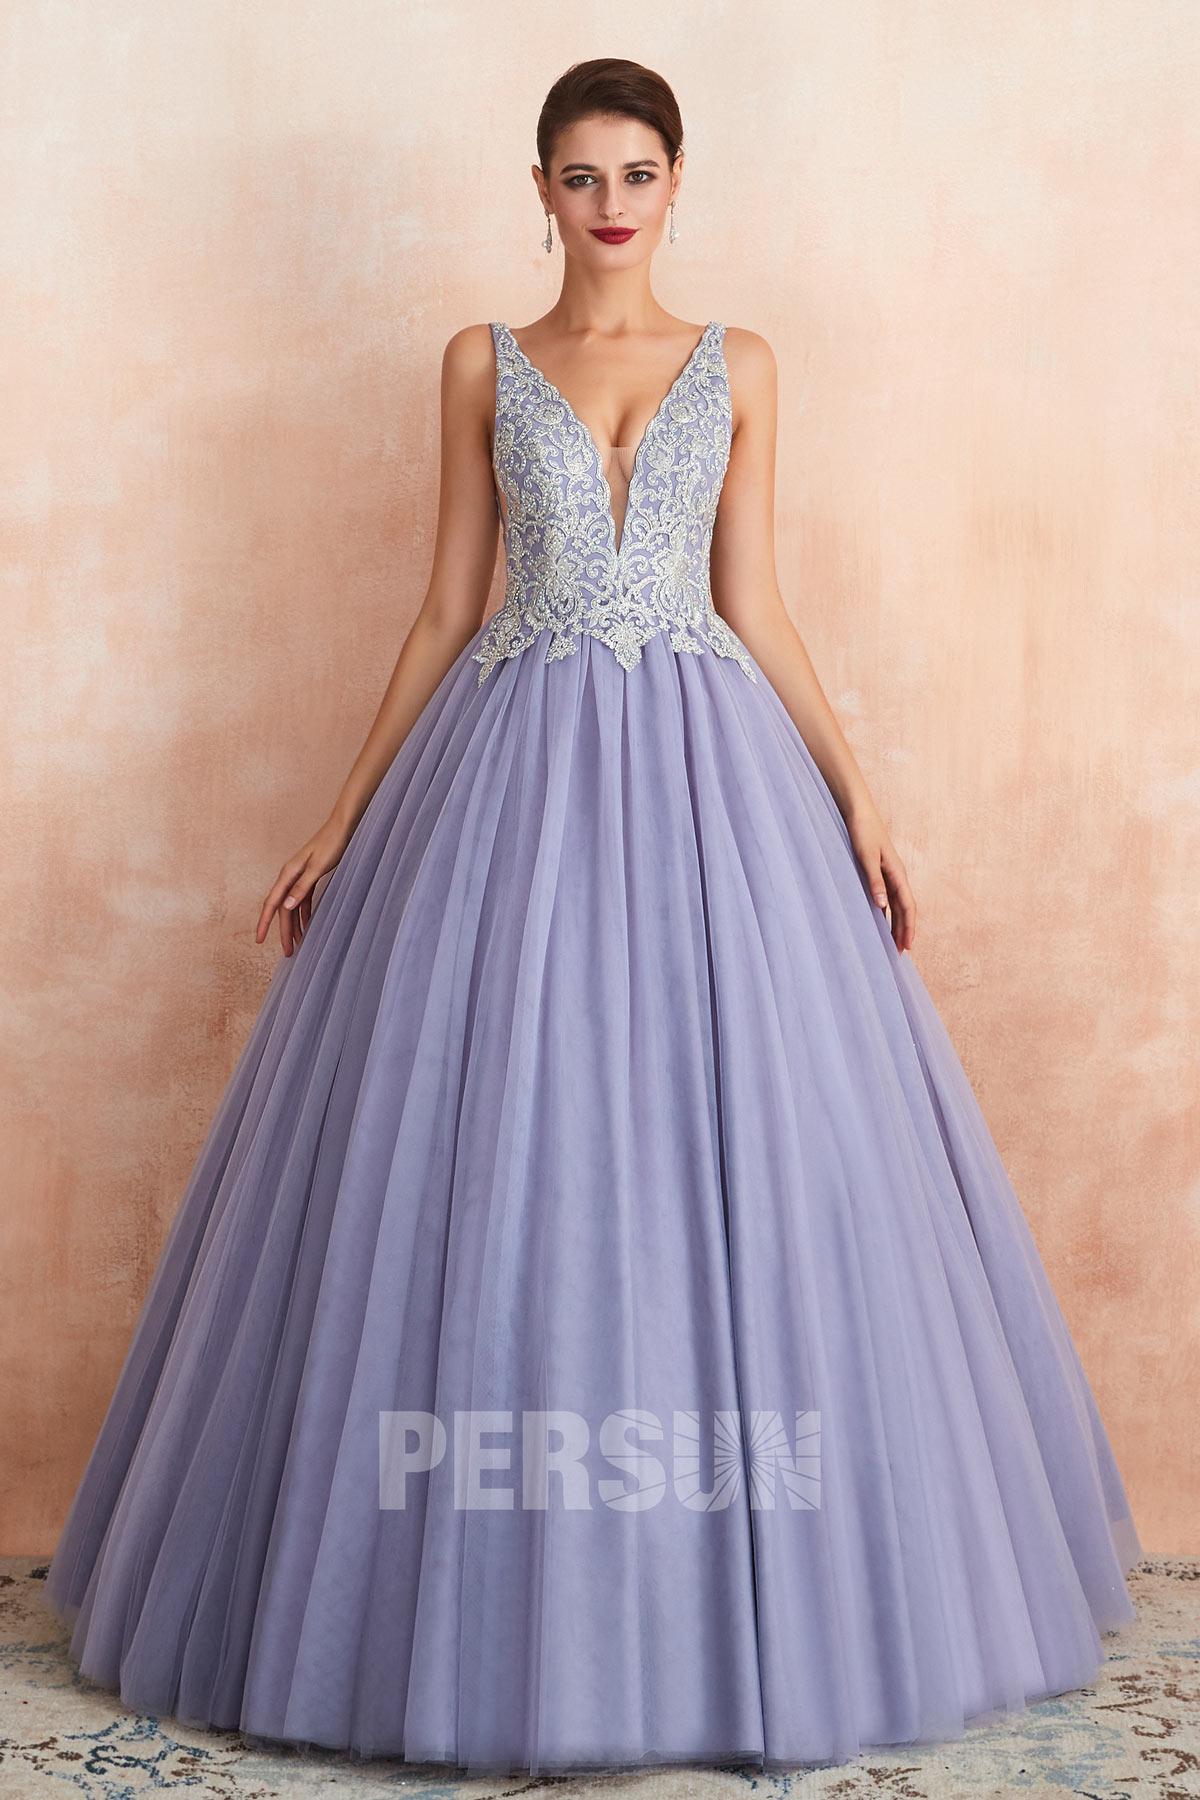 Günstig Elegantes Lavendel Ballkleid Prinzessin Top ...